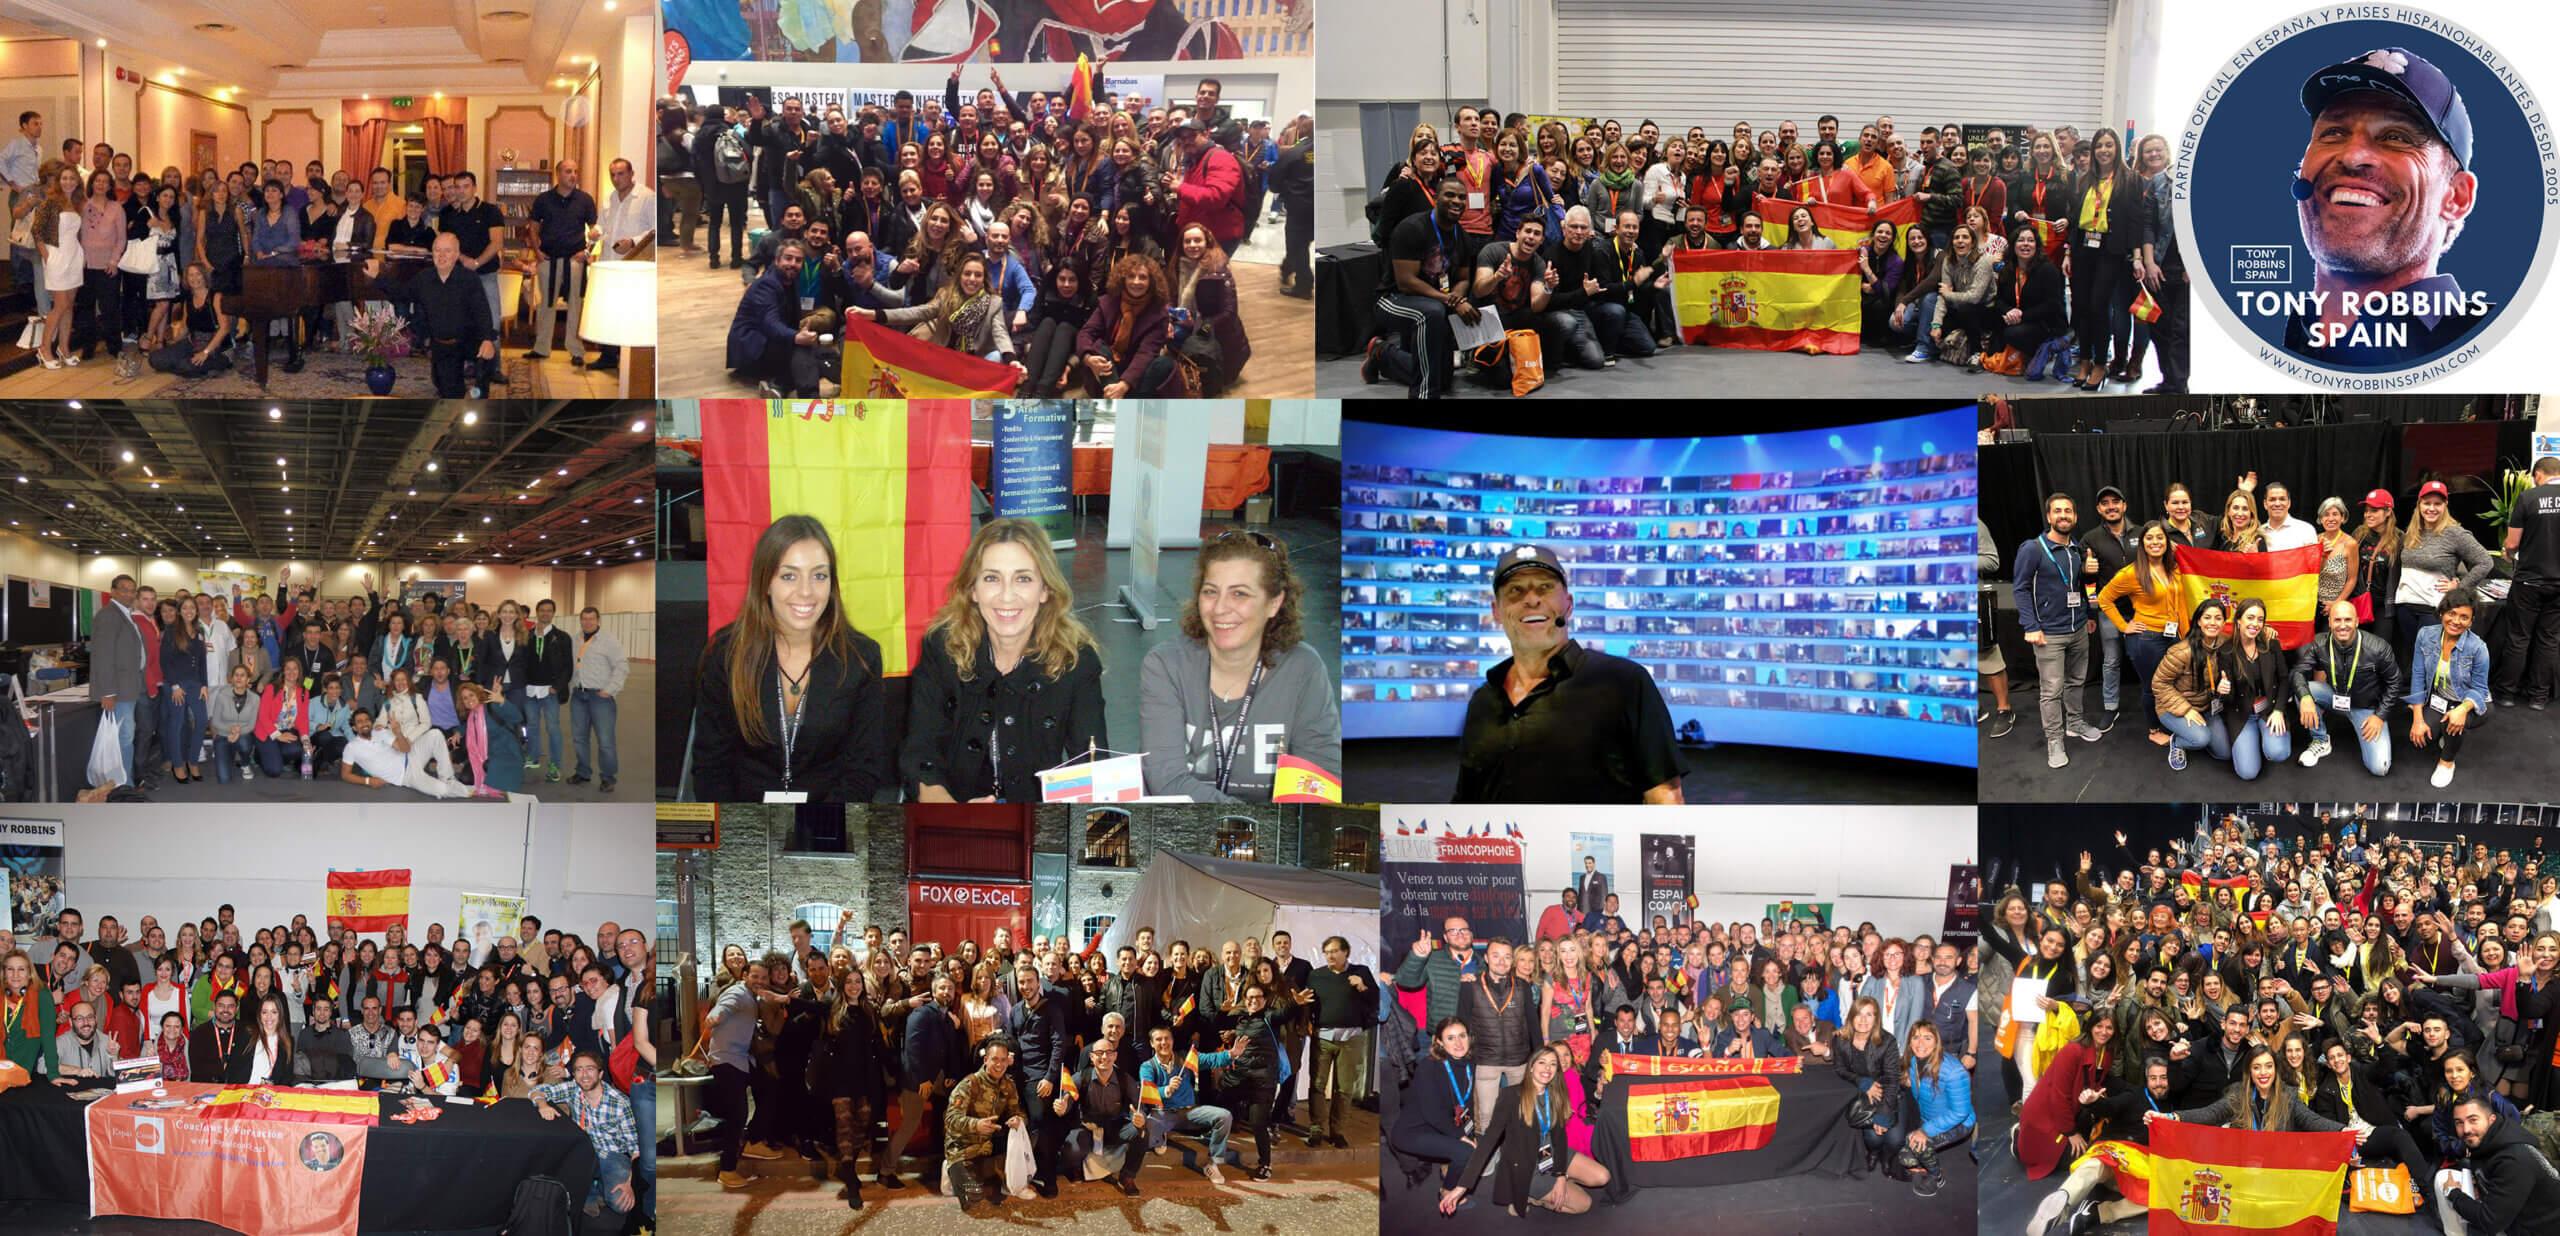 Tony Robbins Spain participantes